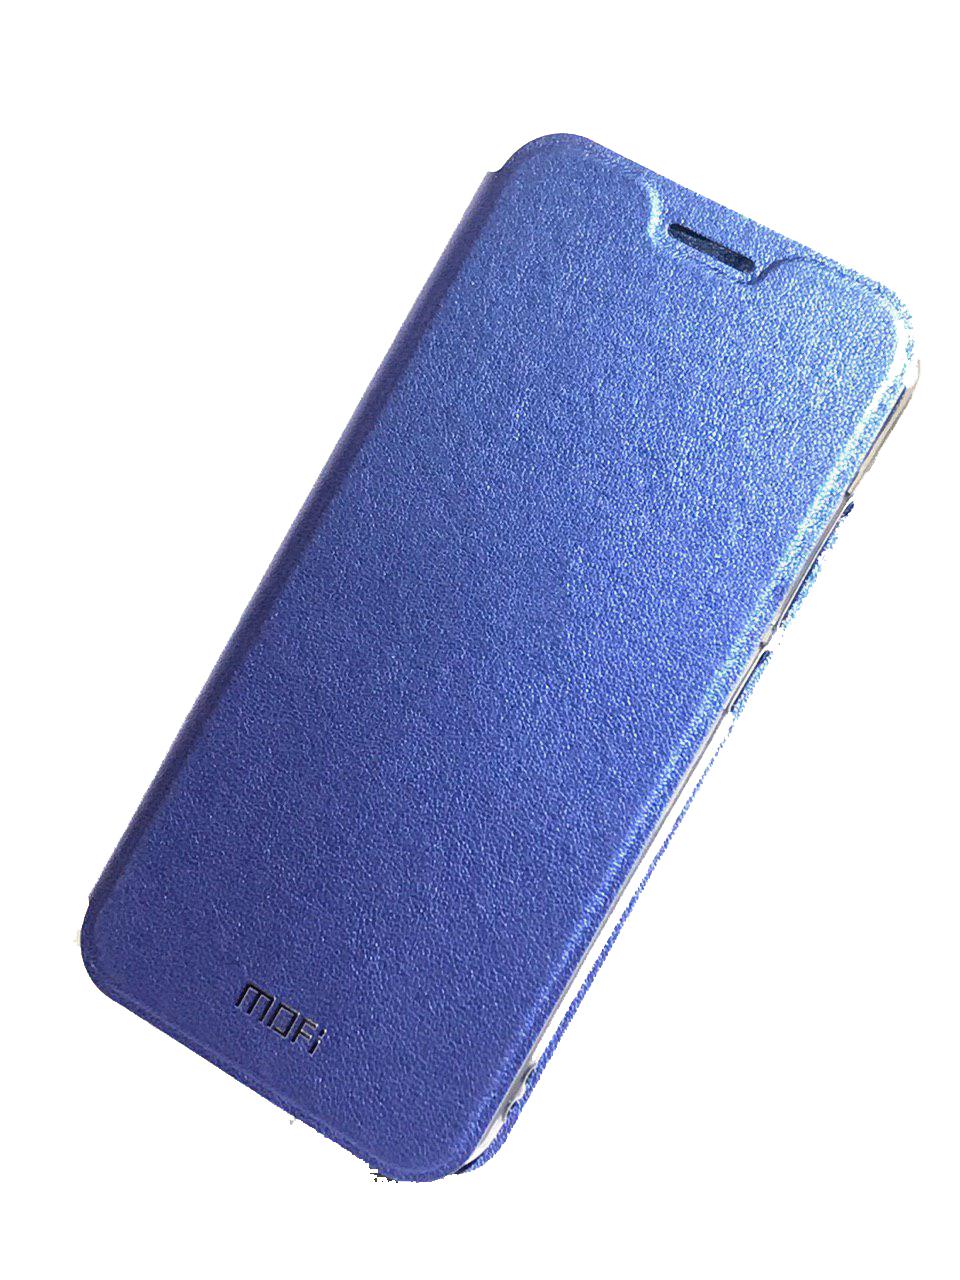 Чехол для сотового телефона Mofi Книжка Grain Xiaomi Redmi Note 5/ 5 Pro Blue, синий чехол книжка interstep vibe для xiaomi redmi note 5 pro черный